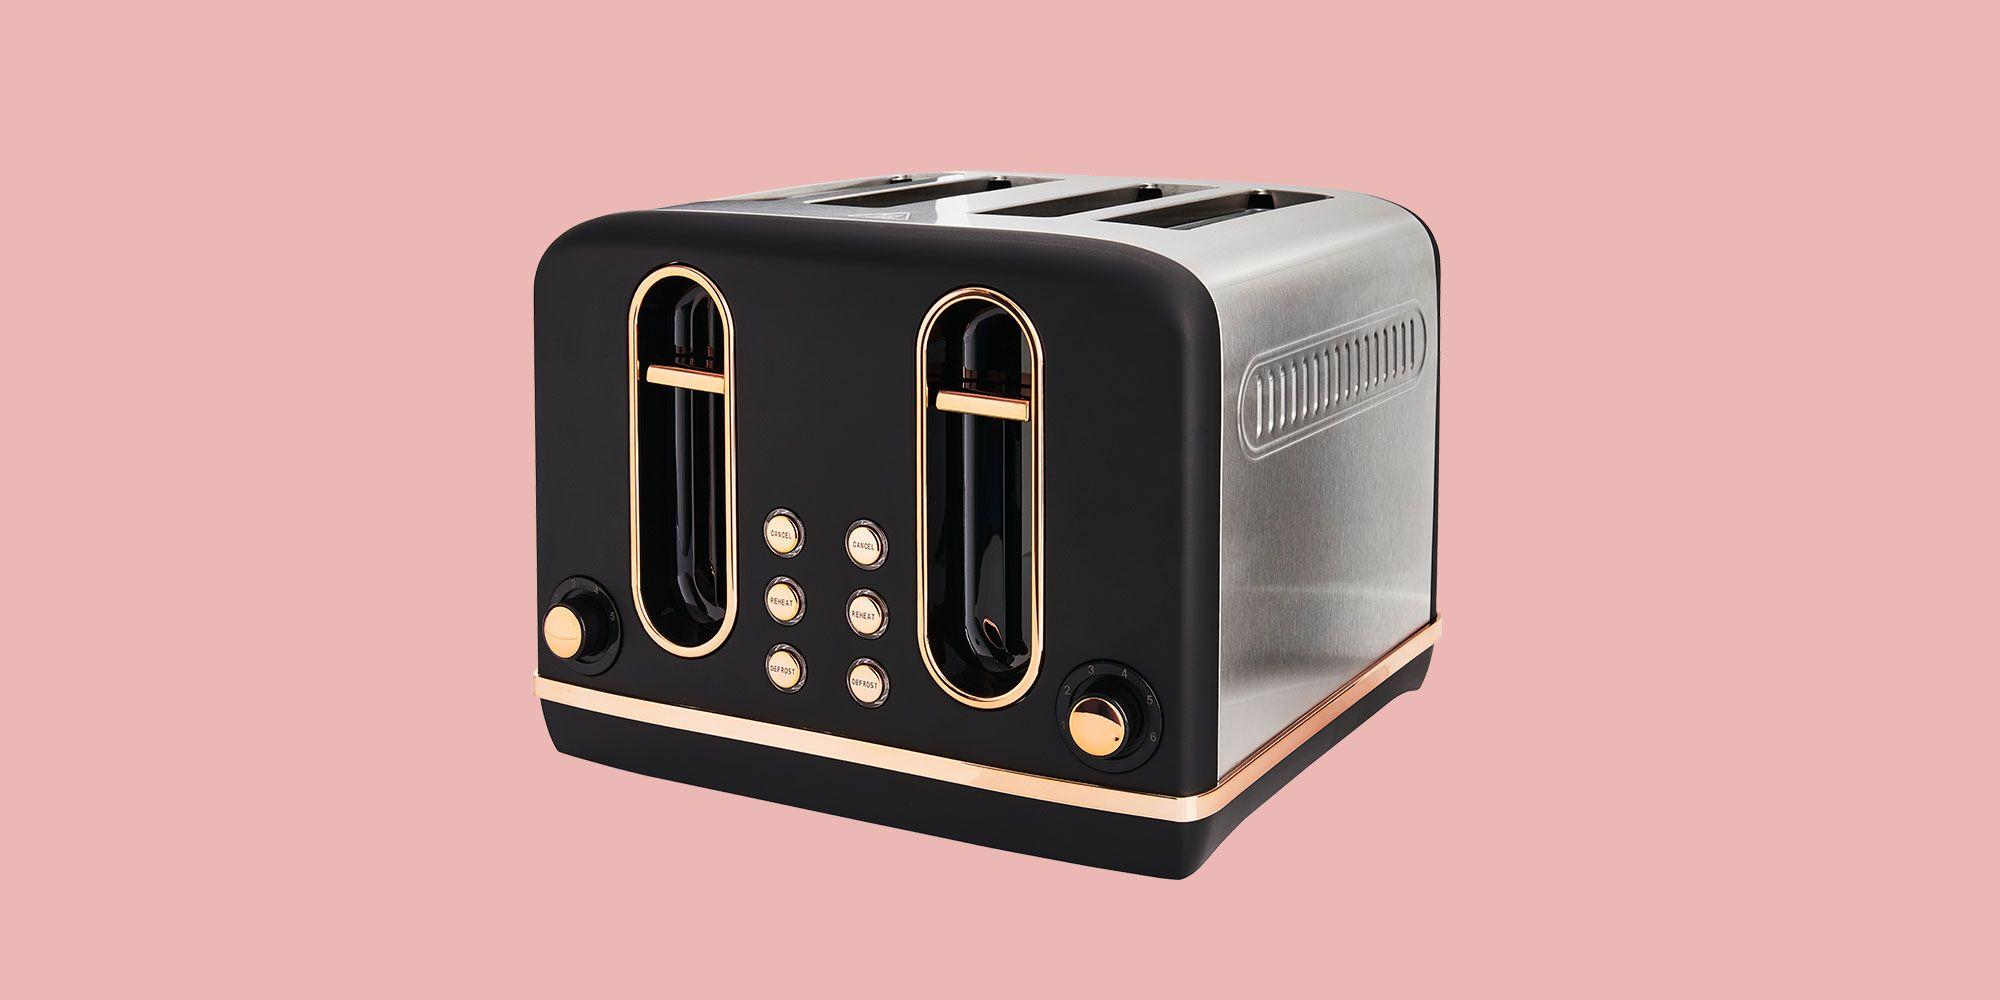 copper kitchen, Toaster, Black toaster